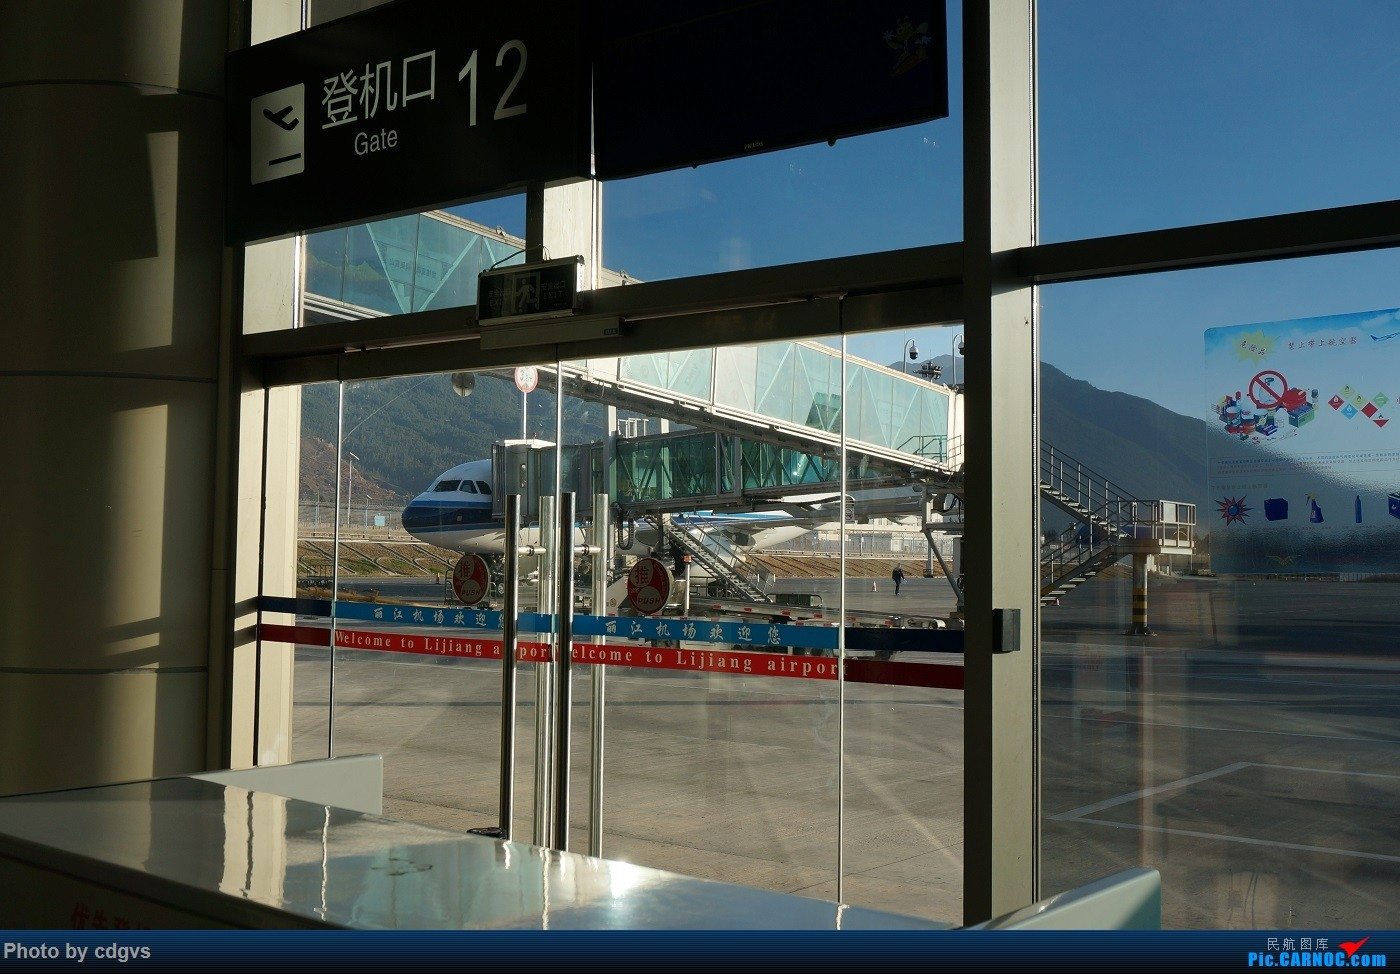 Re:[原创]KMG-LJG-KMG 东航&南航 省内刷航段,飞空客波音两种不同机型 AIRBUS A320-200 B-1621 中国丽江三义机场